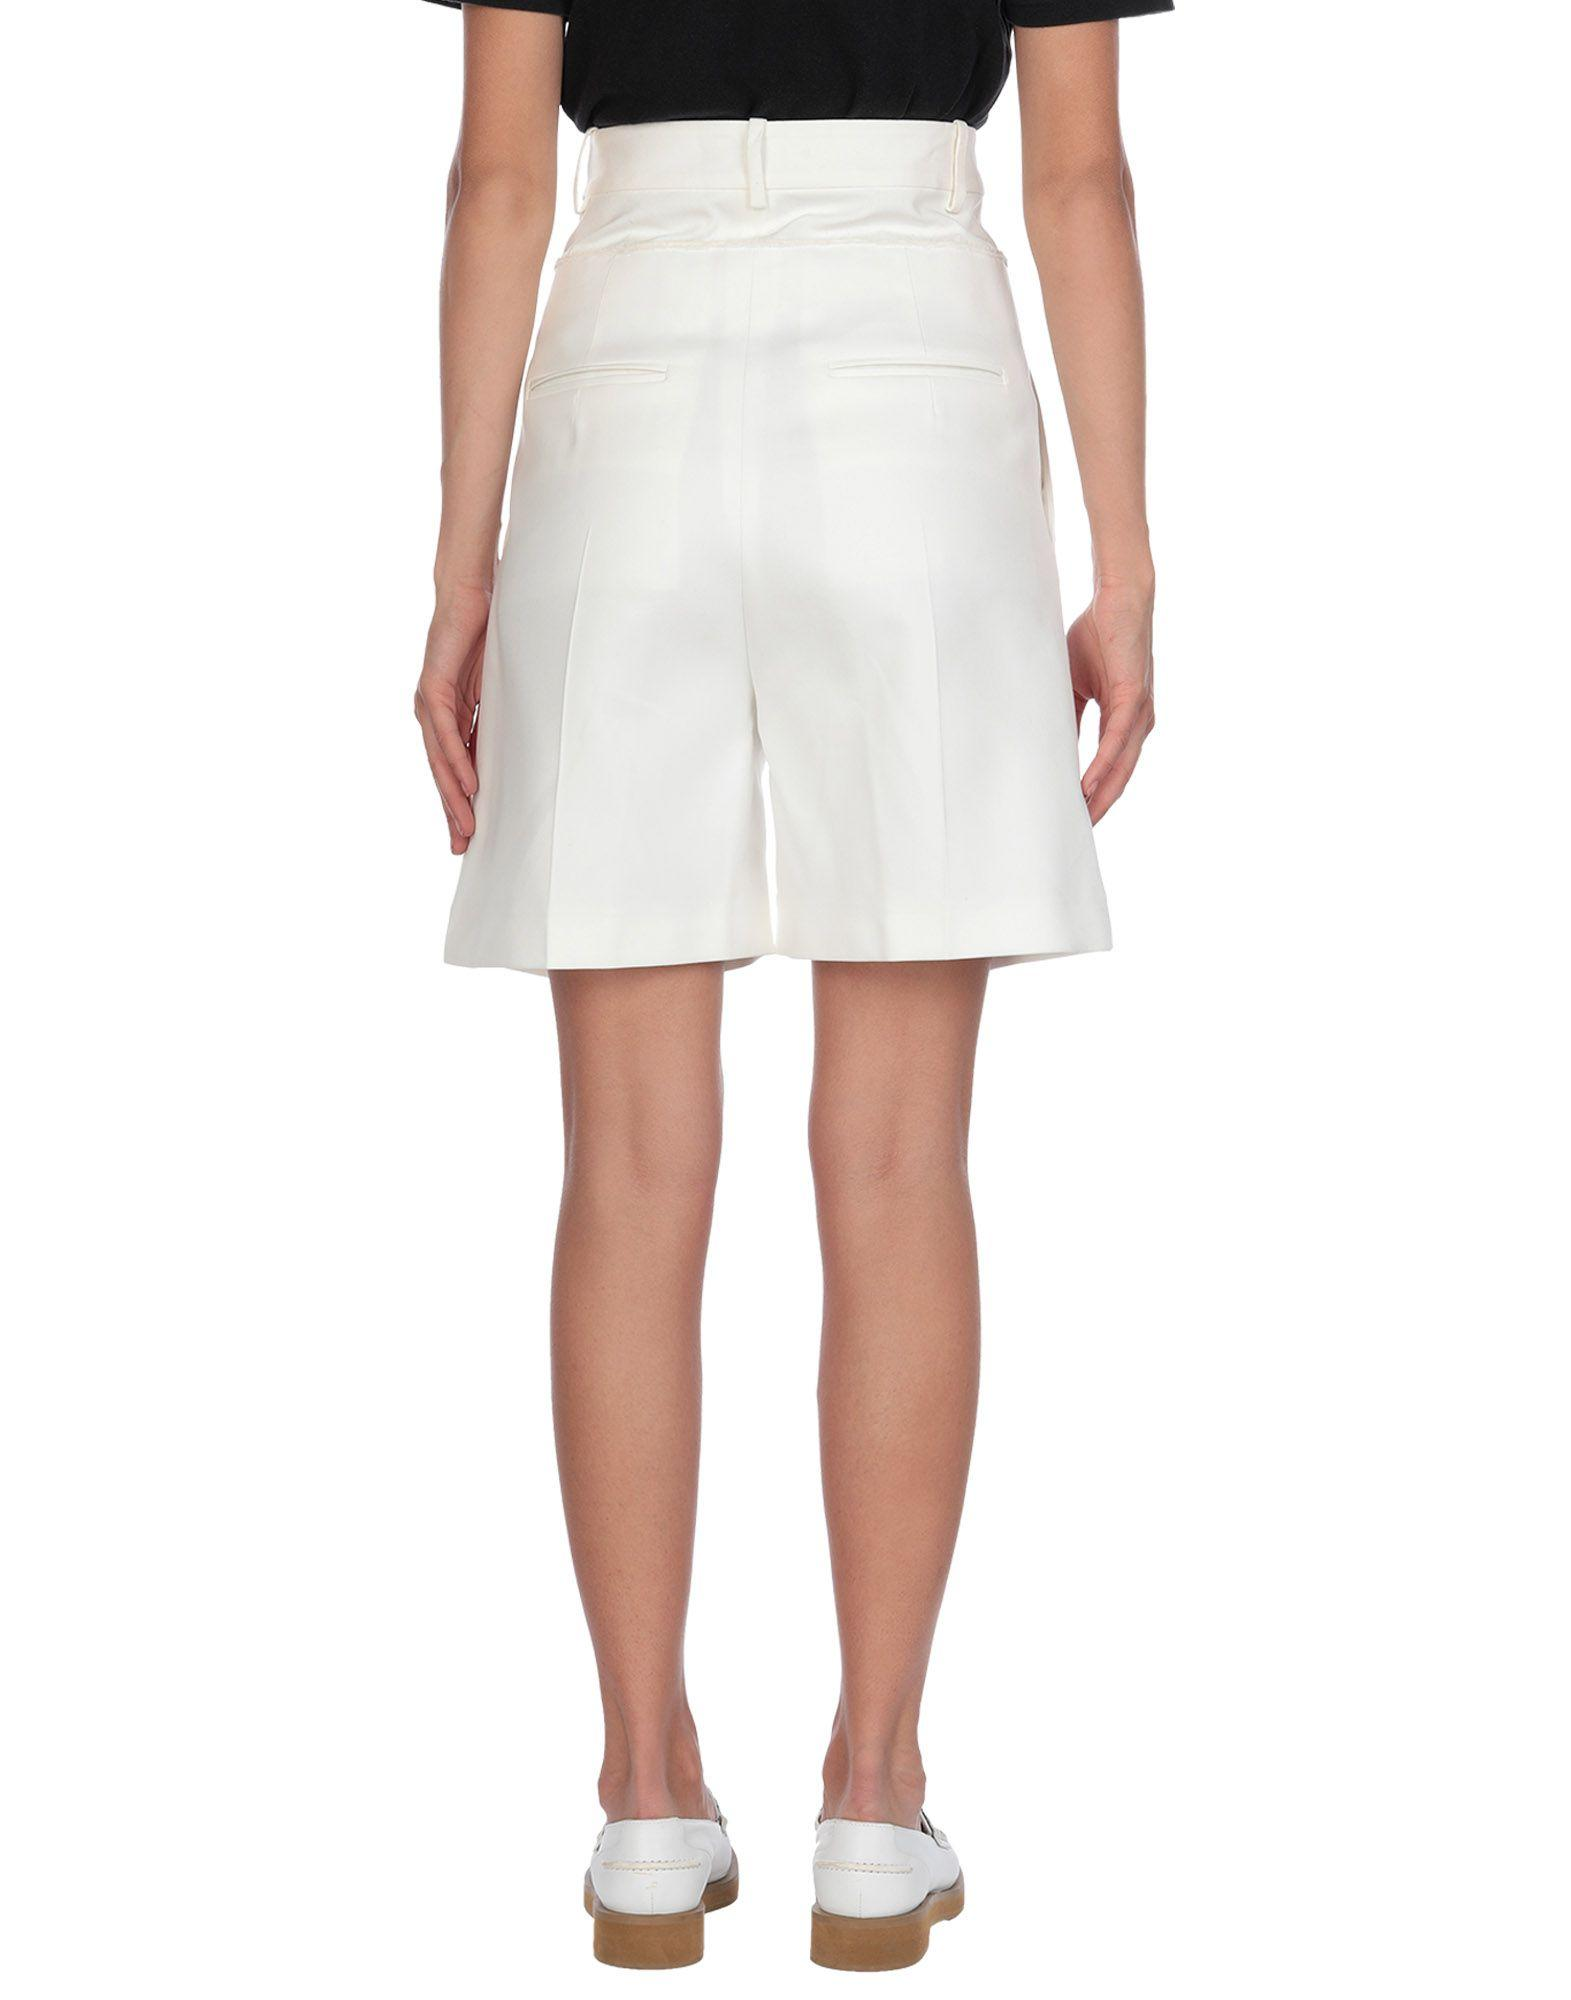 Bermuda Coton Jil Sander en coloris Blanc